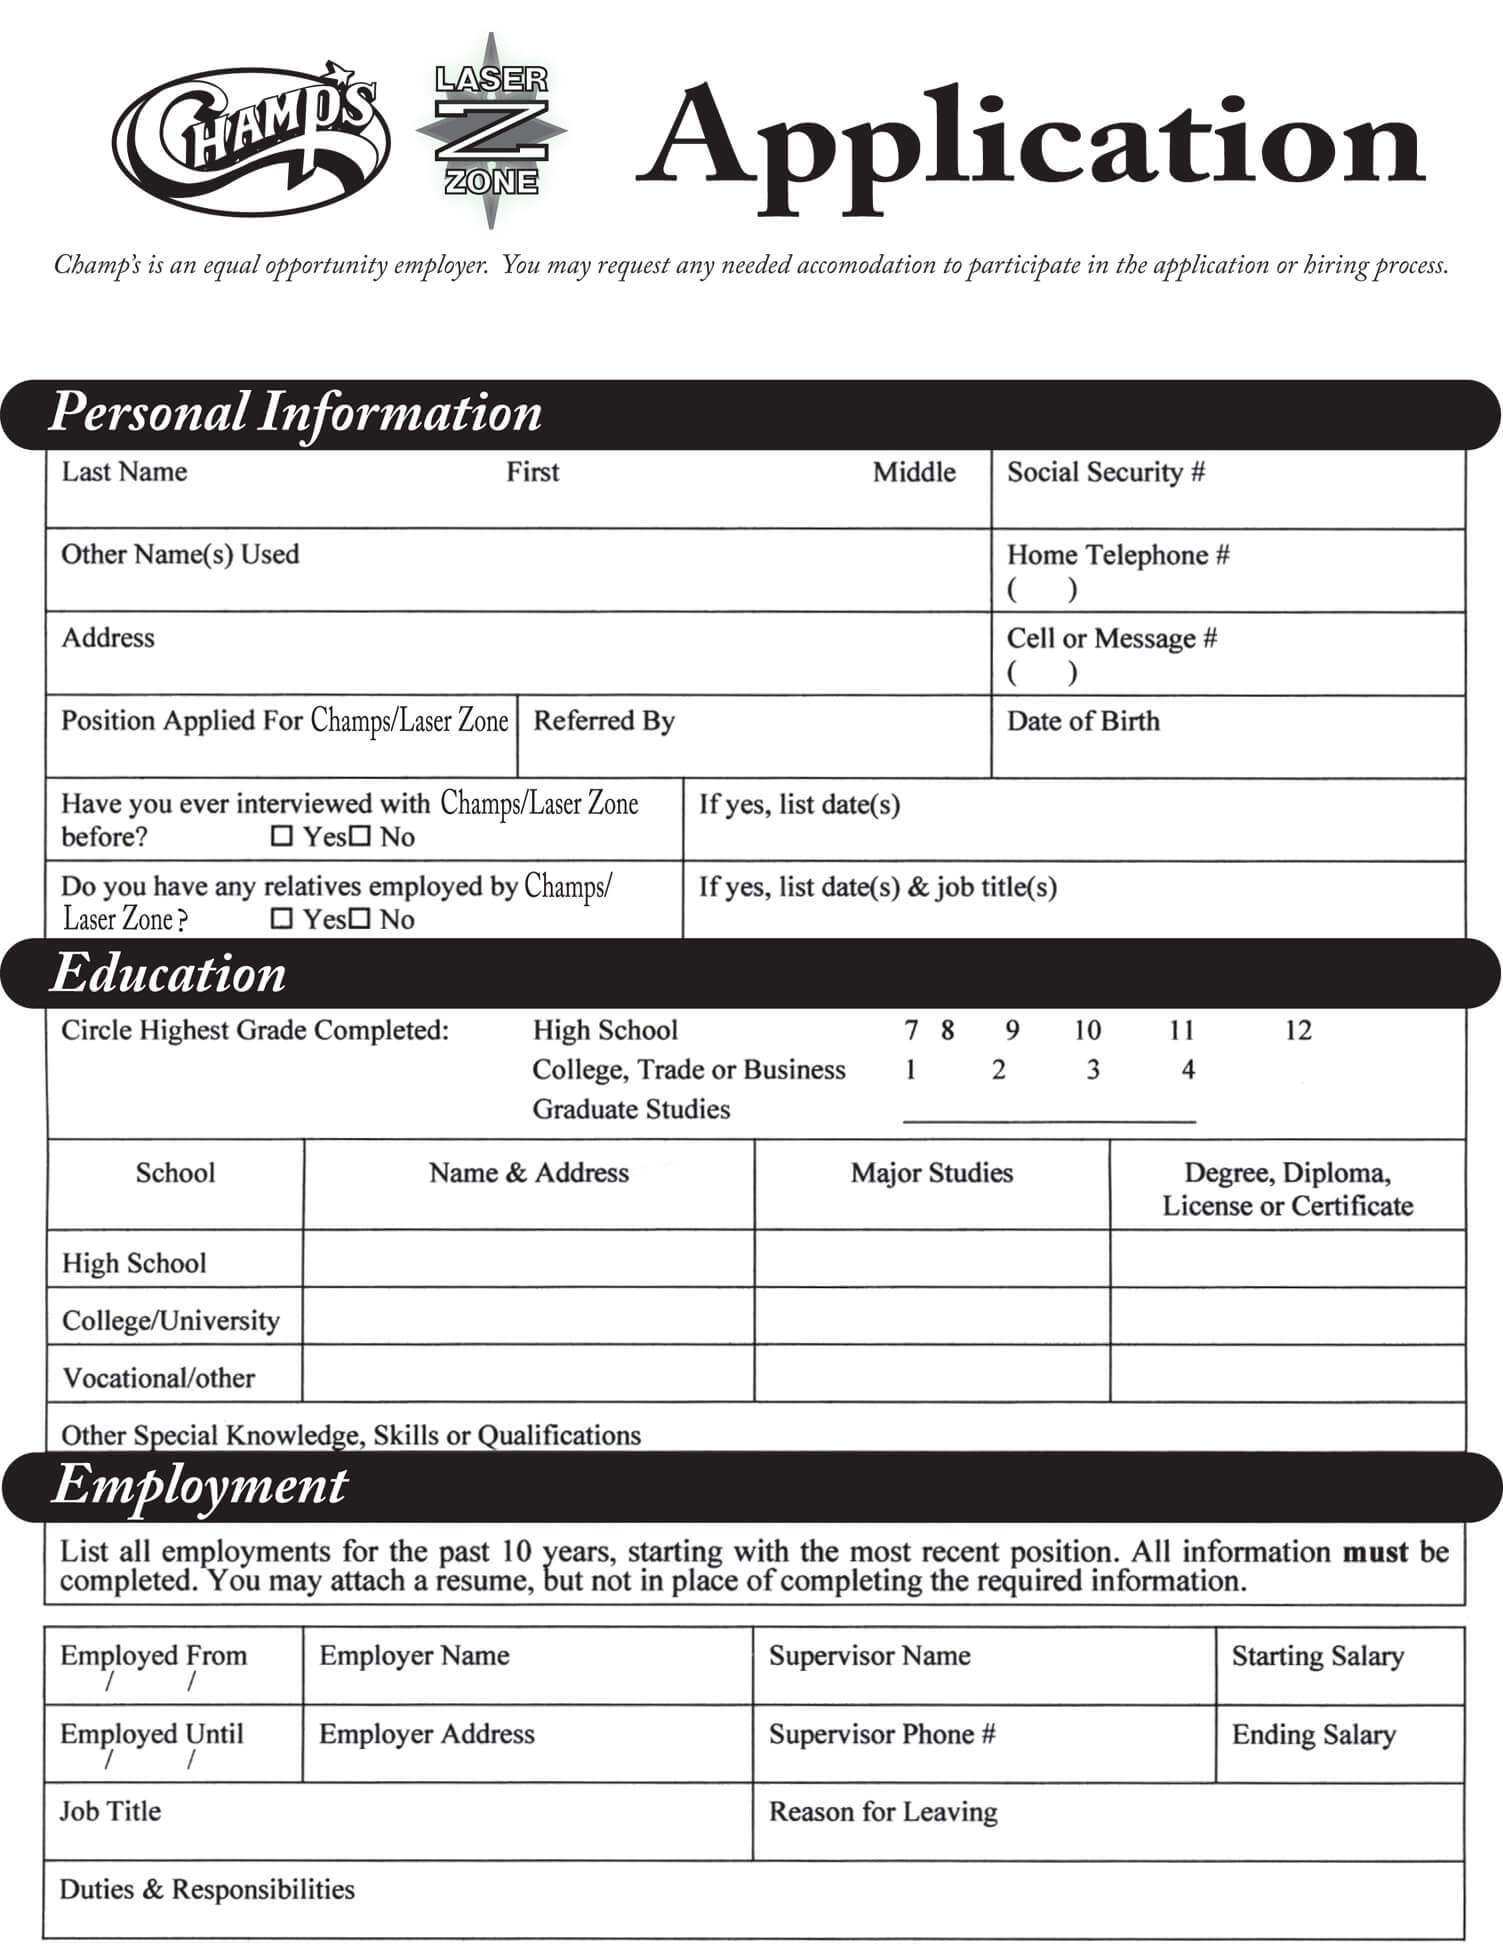 kfc online job application nz